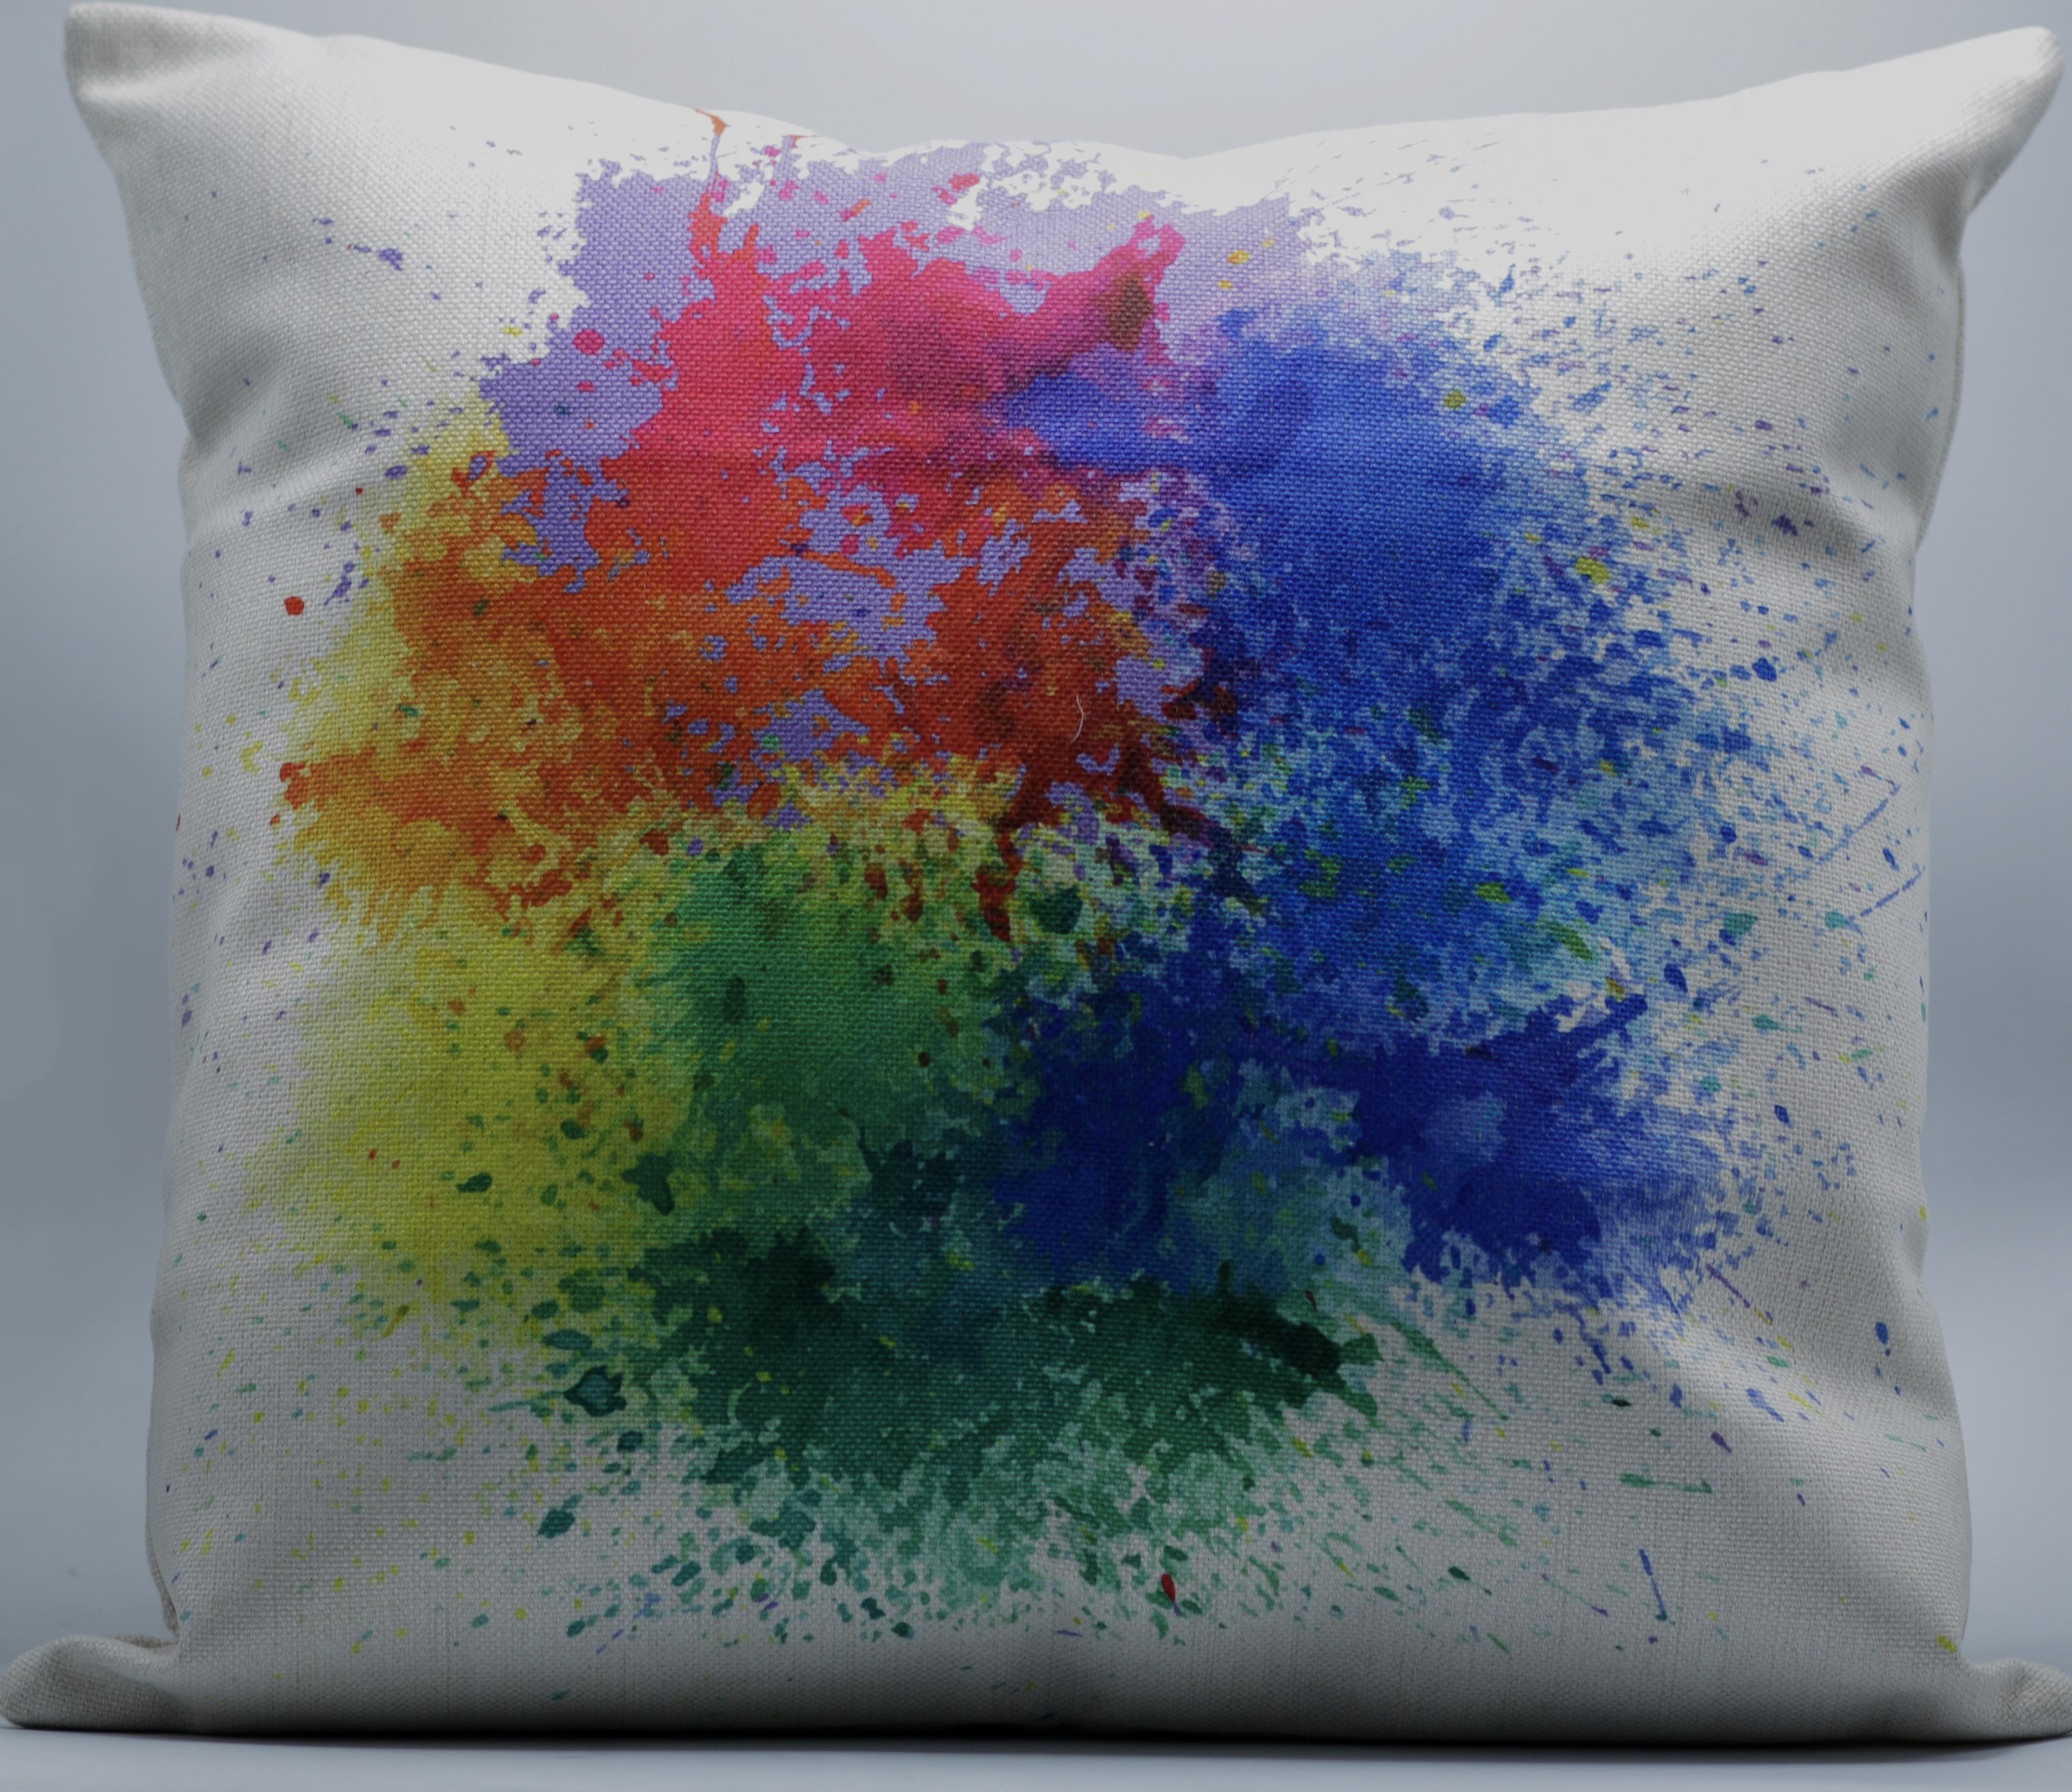 Color Splash Decorative Throw Pillow Cover